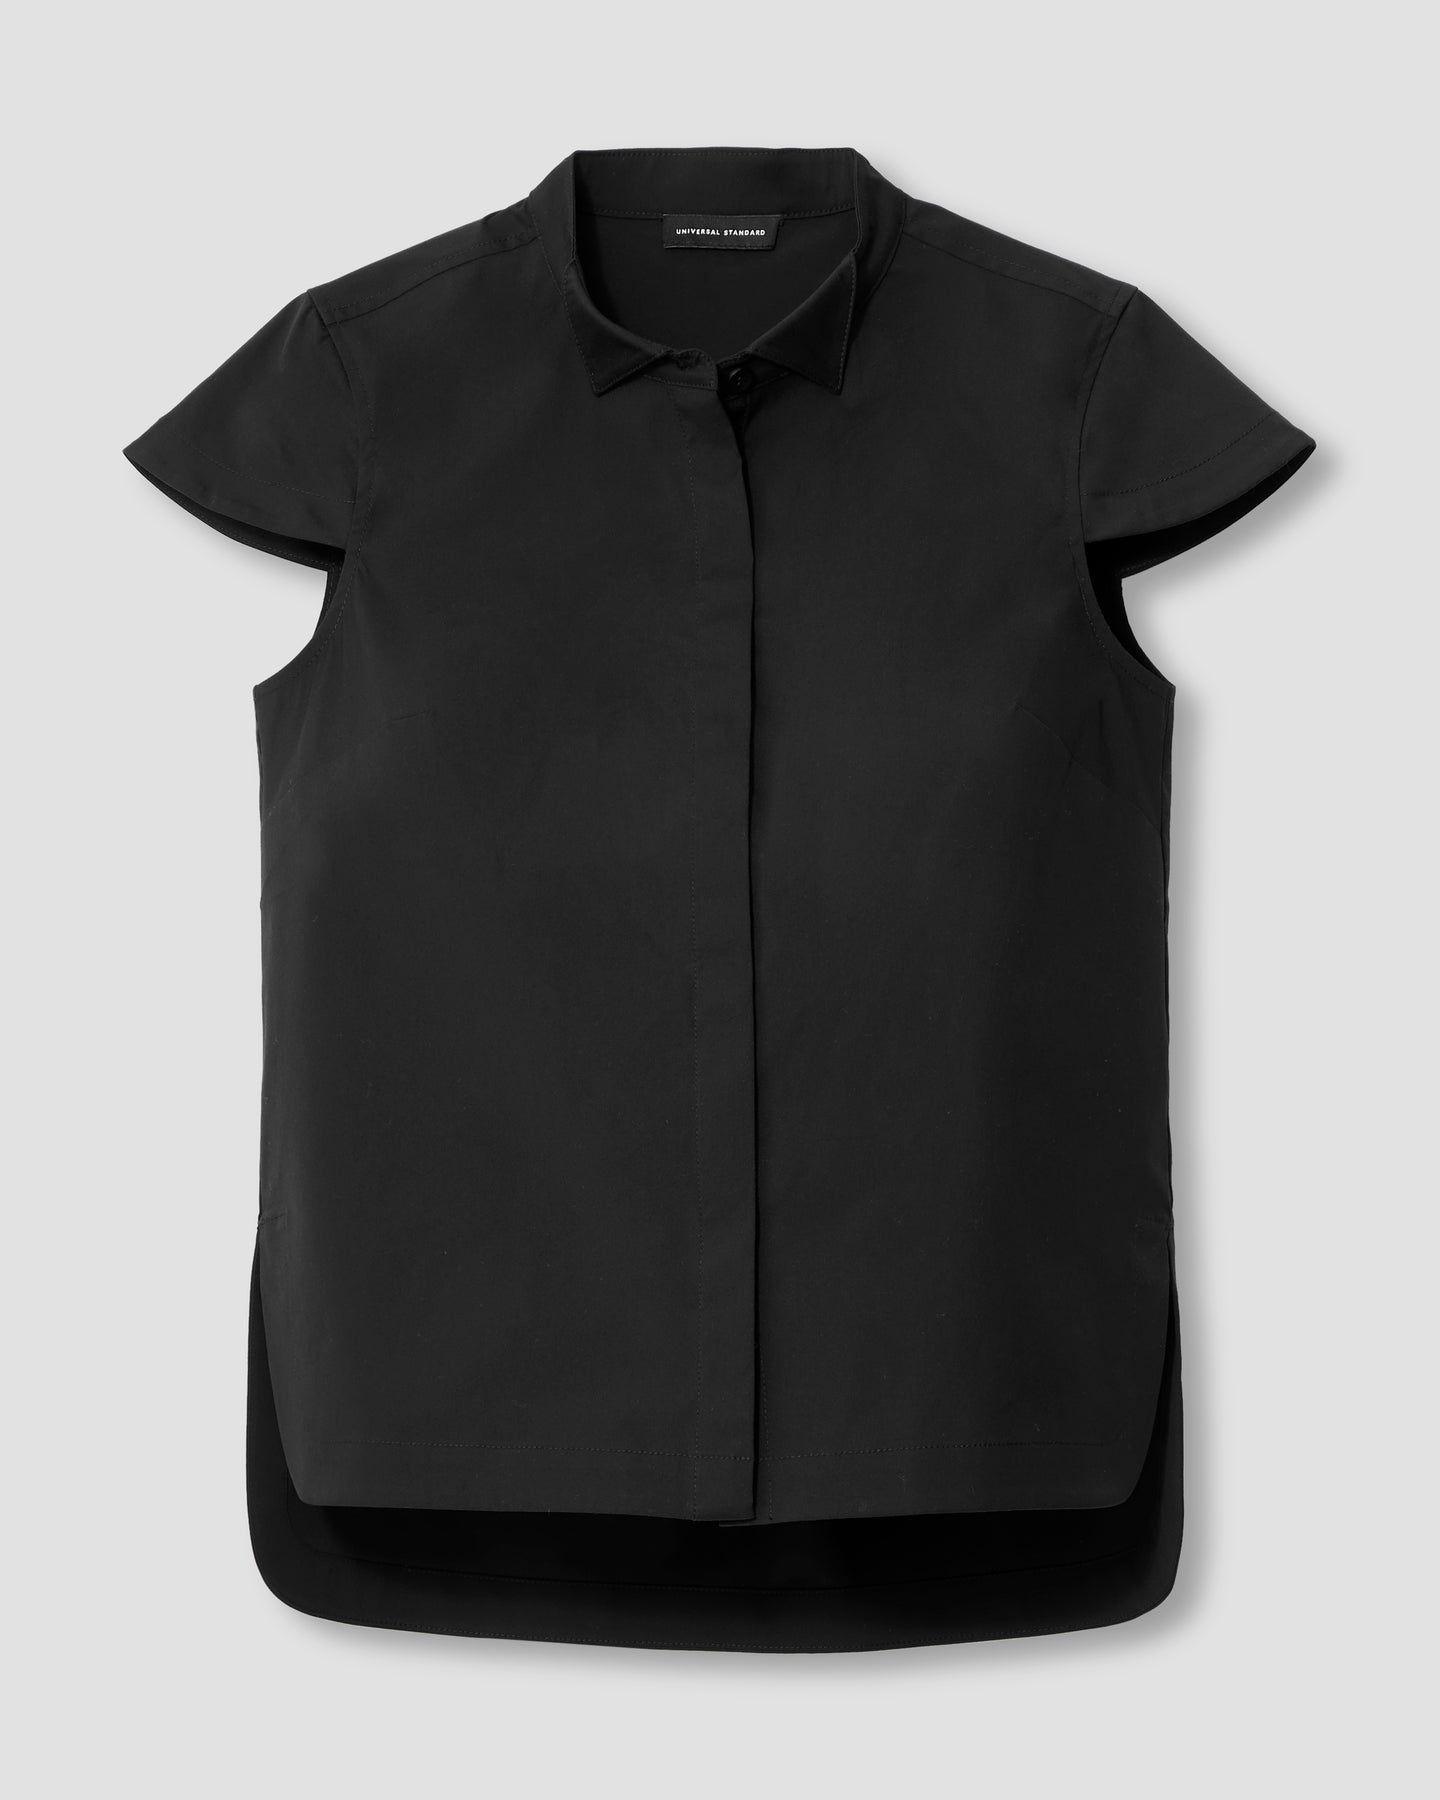 Aster Tuxedo Collar Shirt - Black - image 1